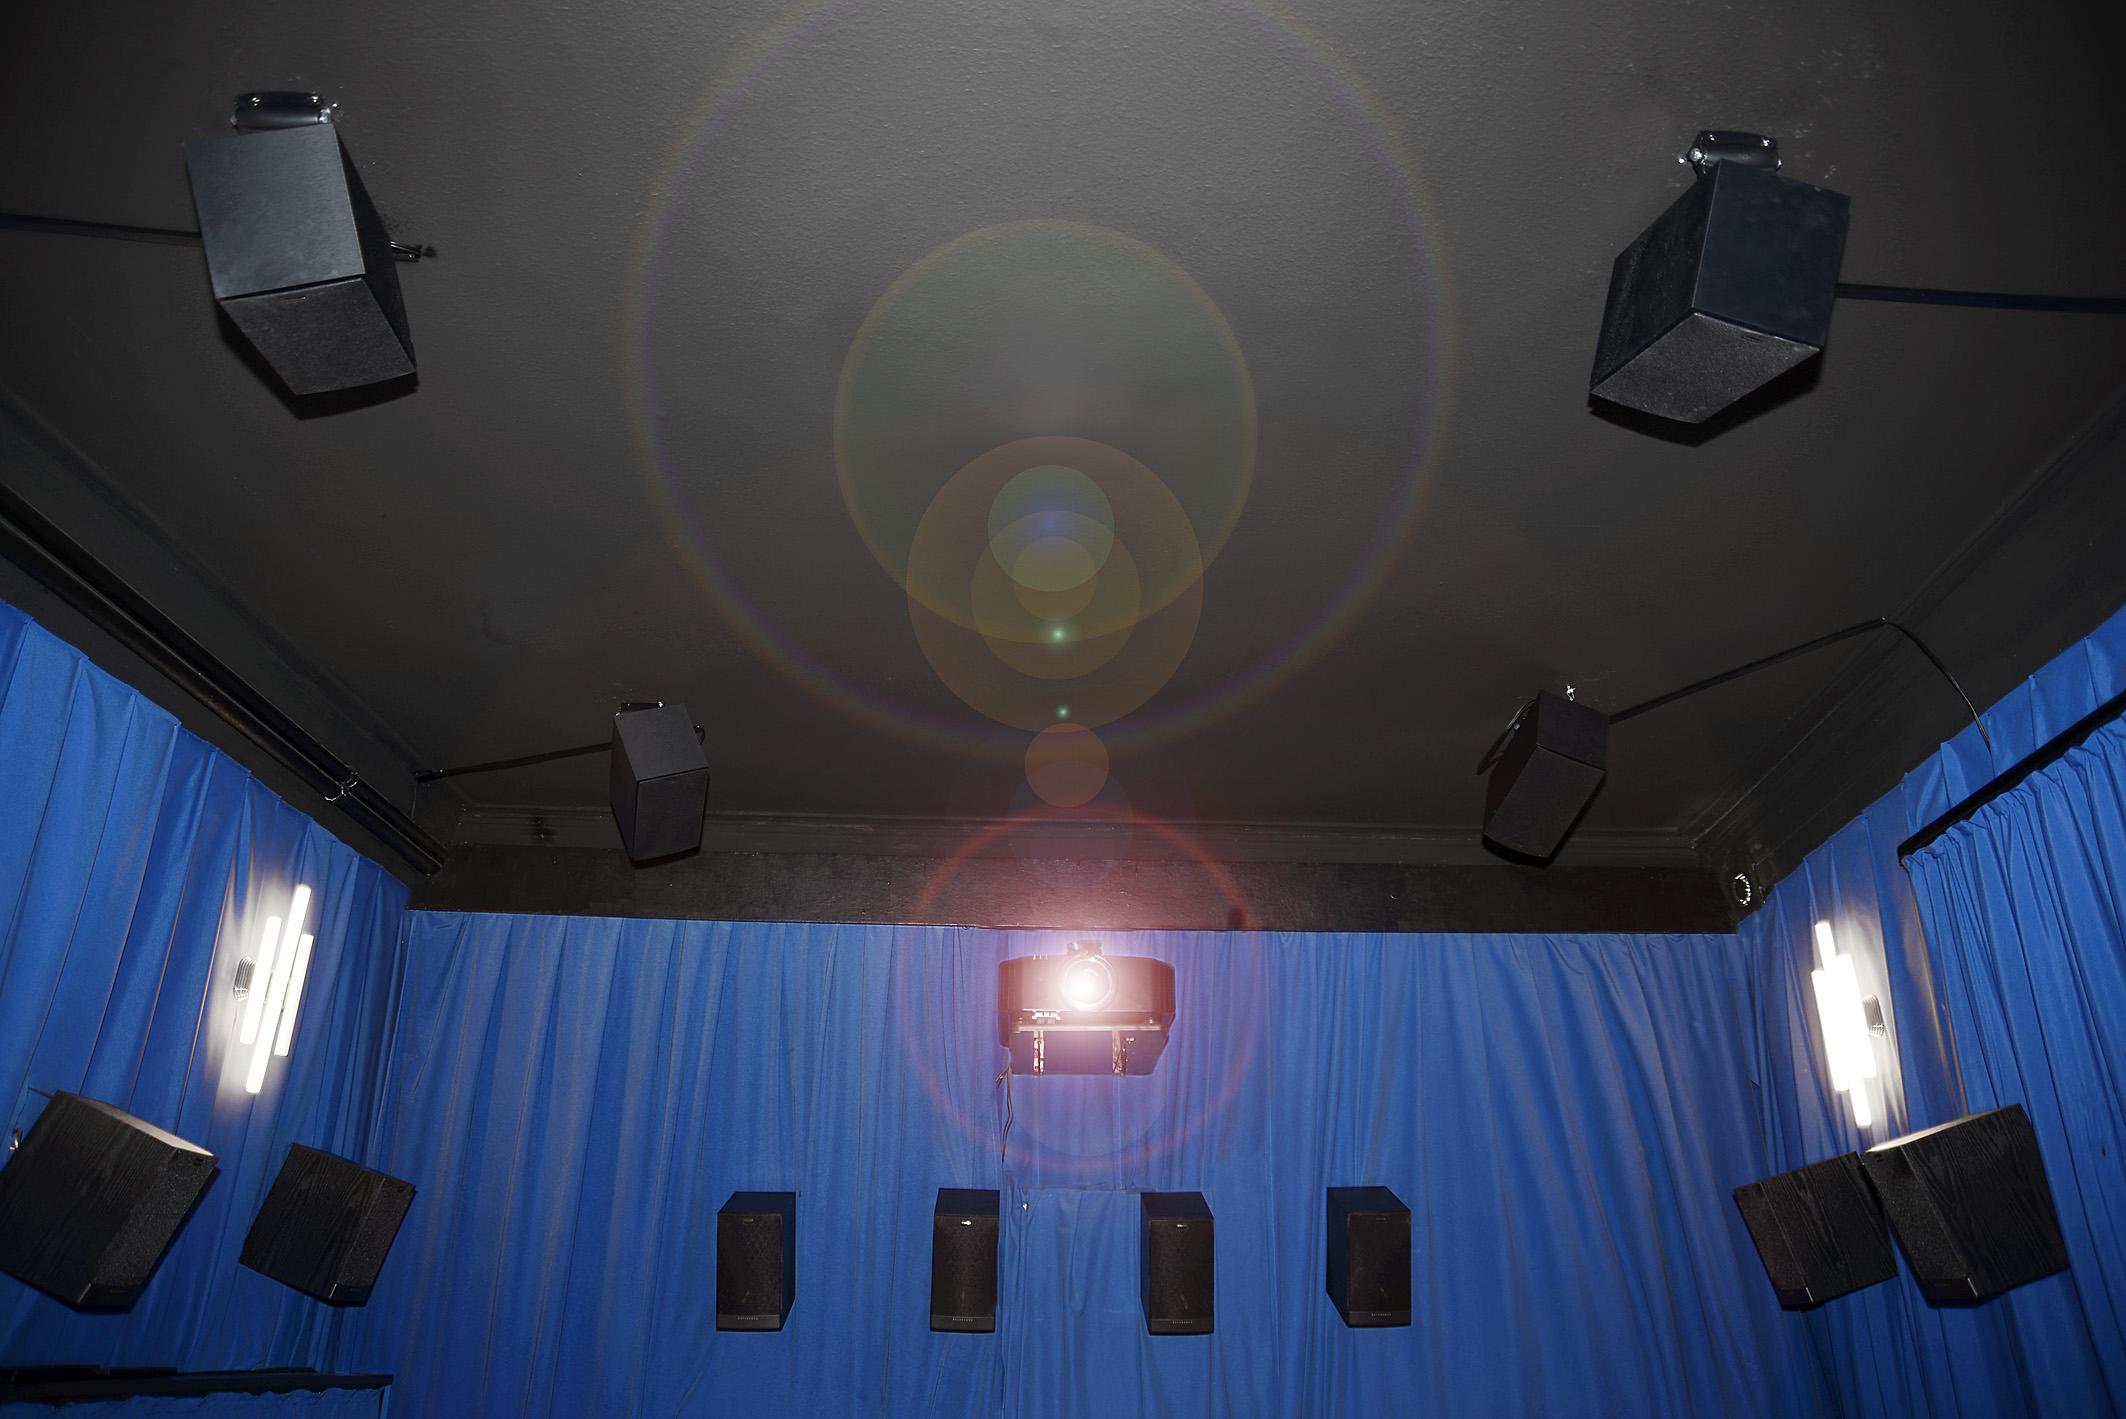 Lumière - DolbyAtmos Installation - Foto Michael B. Rehders